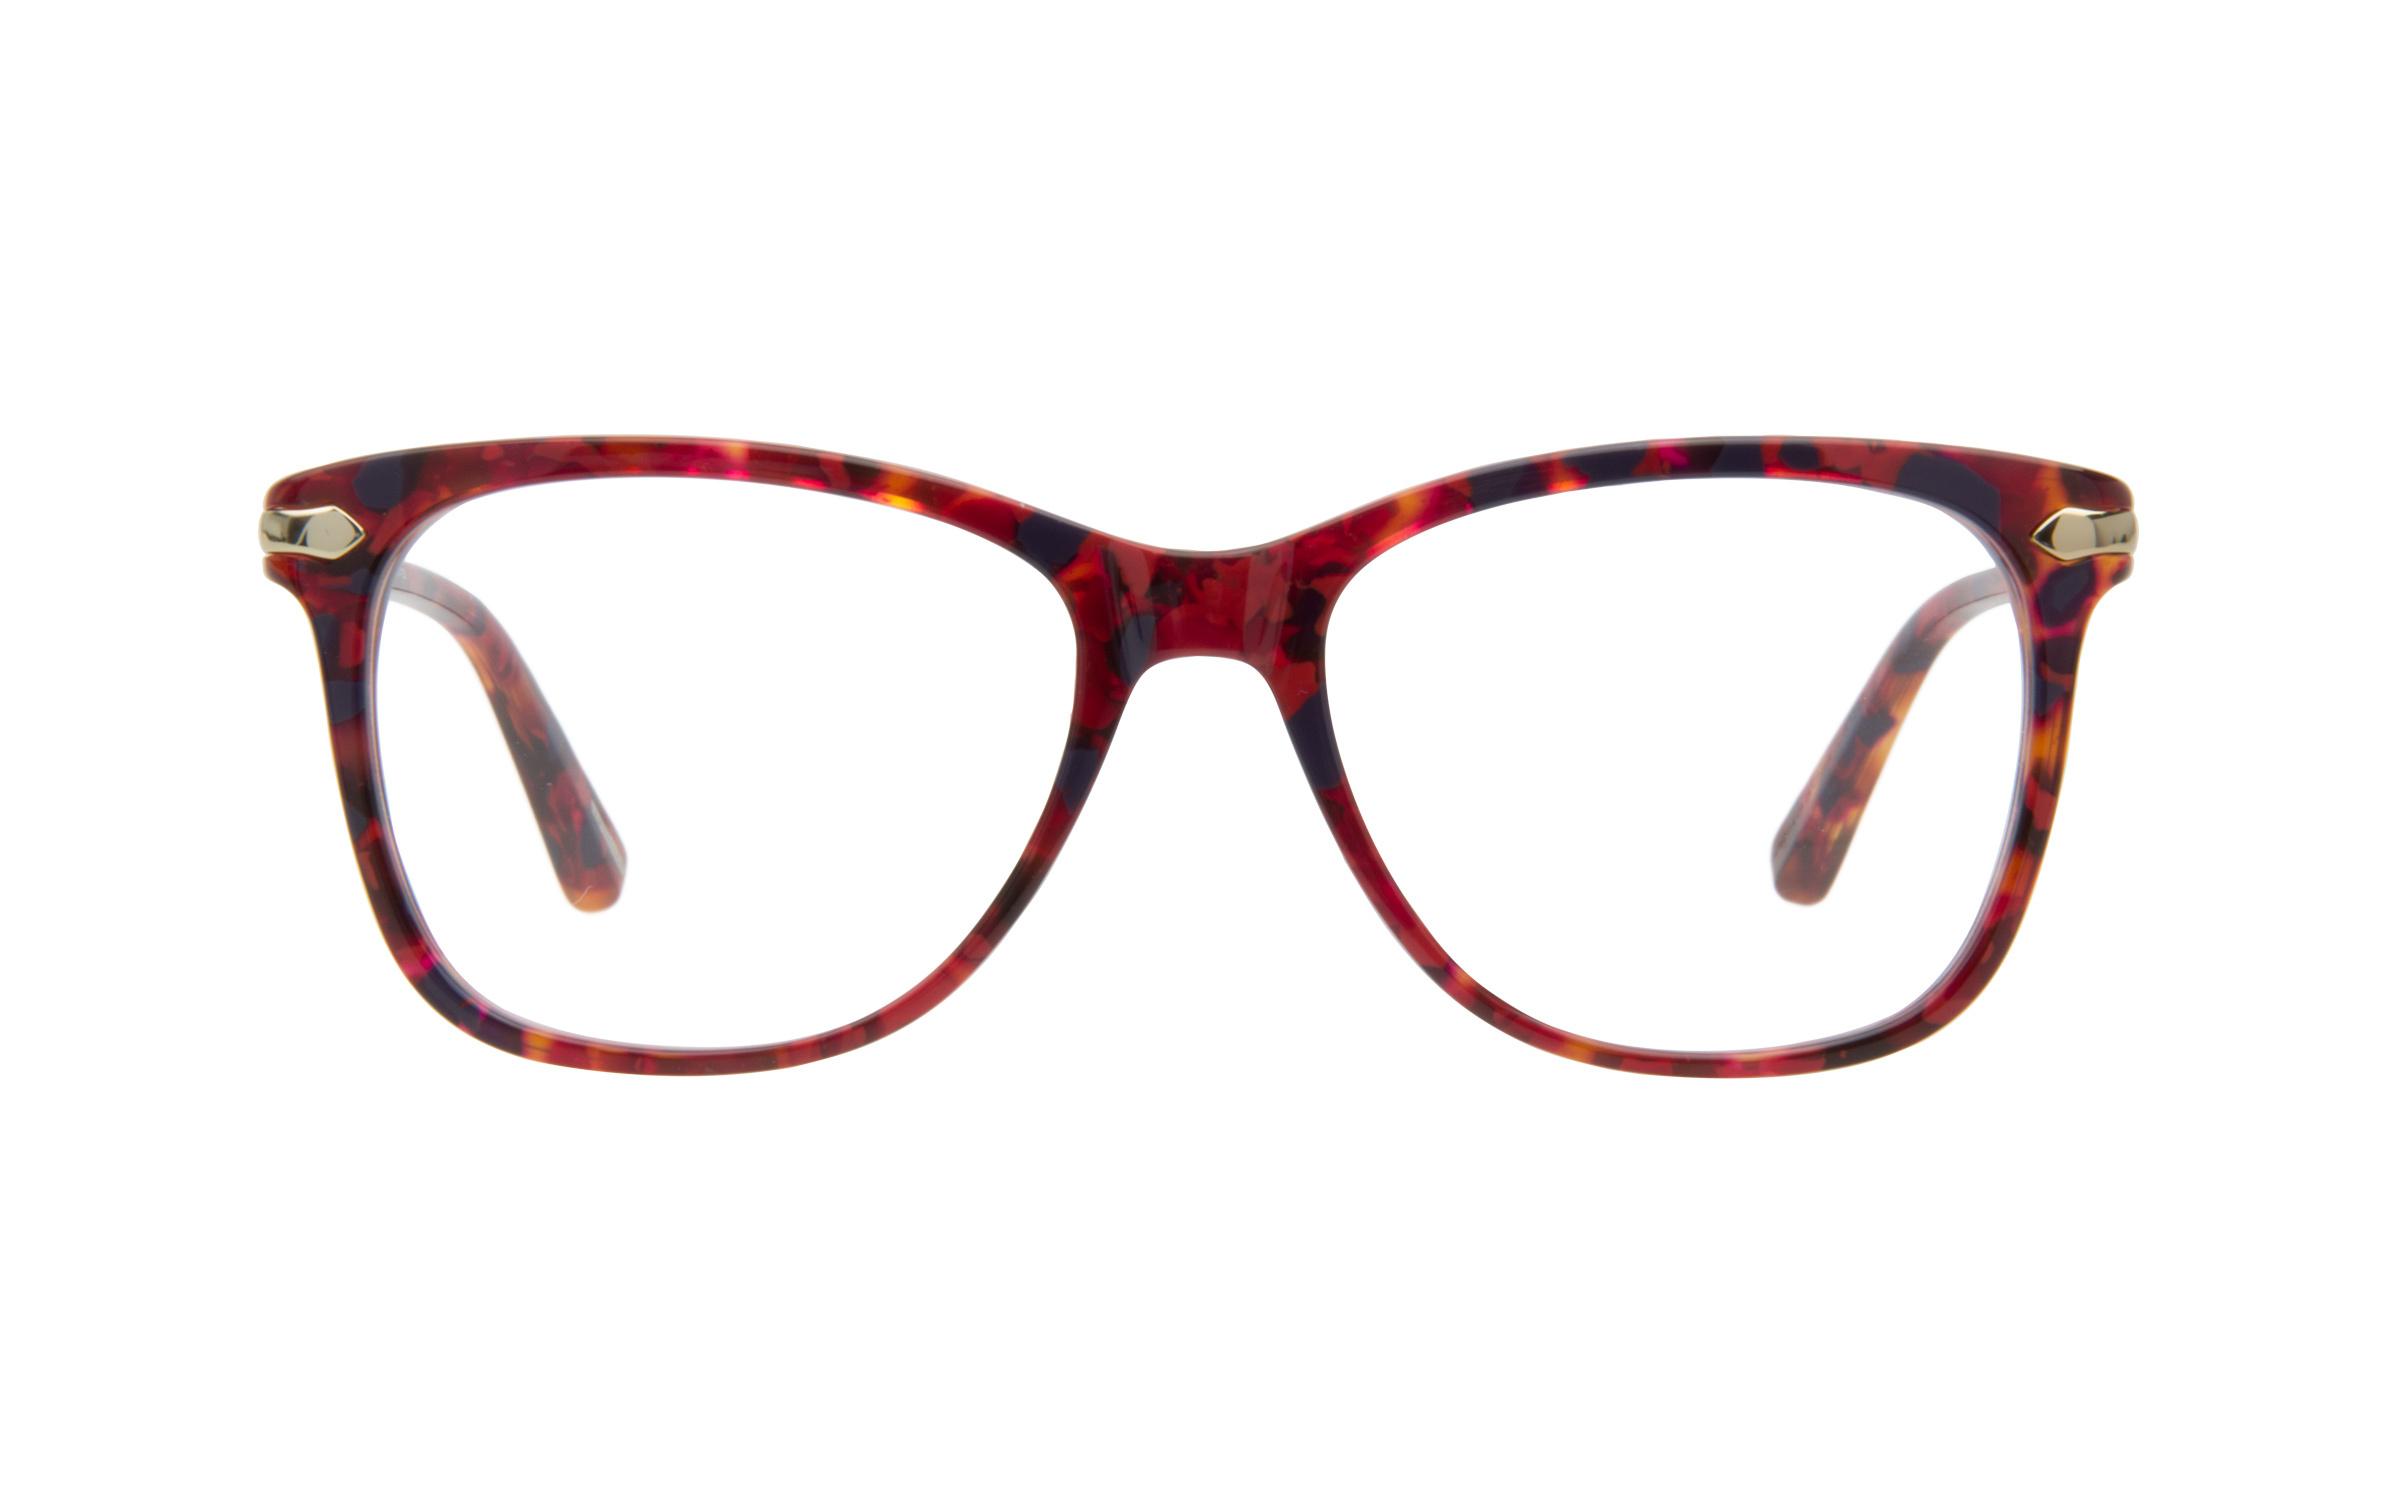 Kam Dhillon Oryx 3090 Marrakesh Red Eyeglasses and Frames...